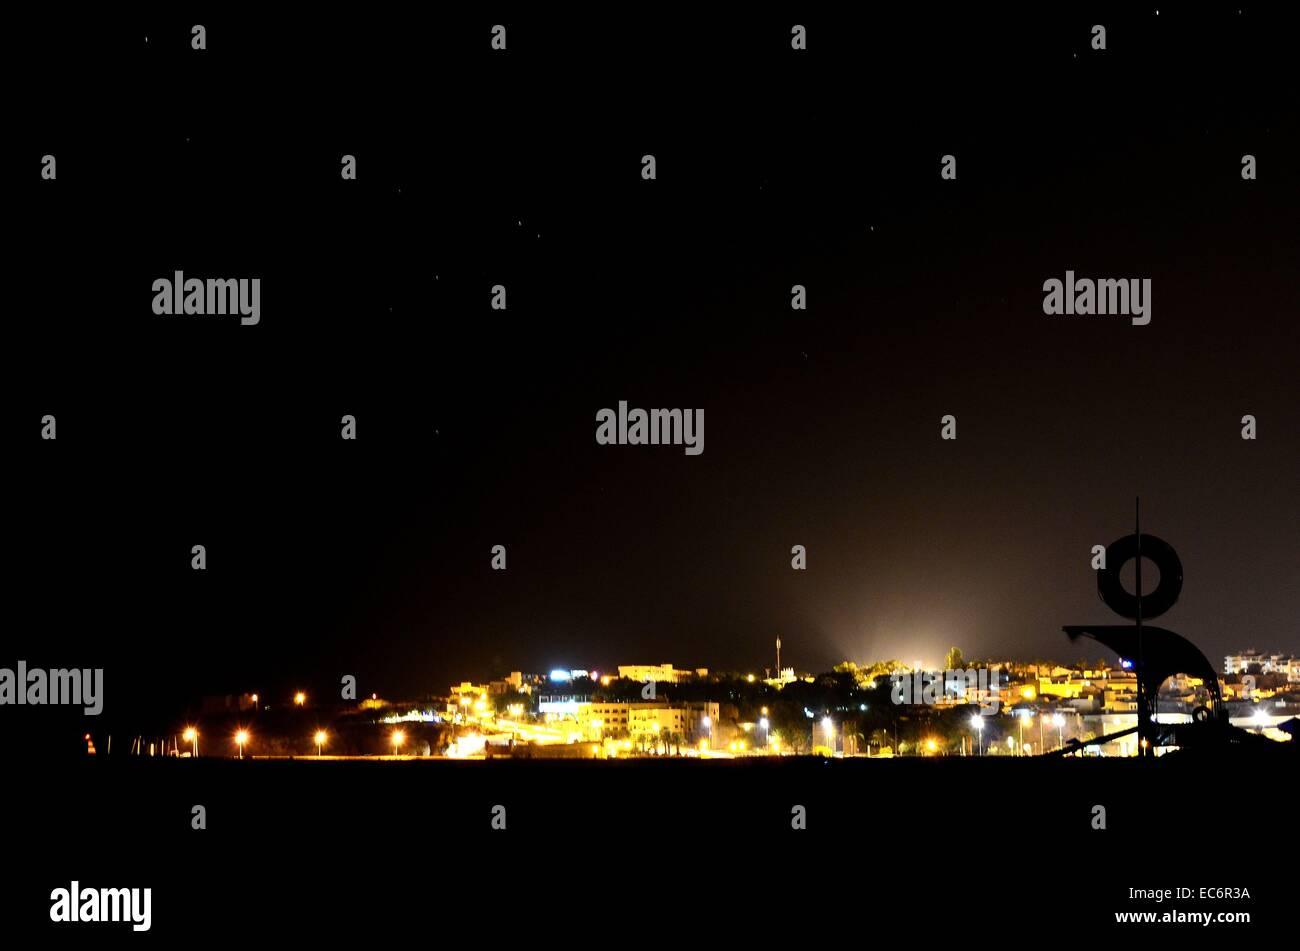 Lagos at night - Stock Image